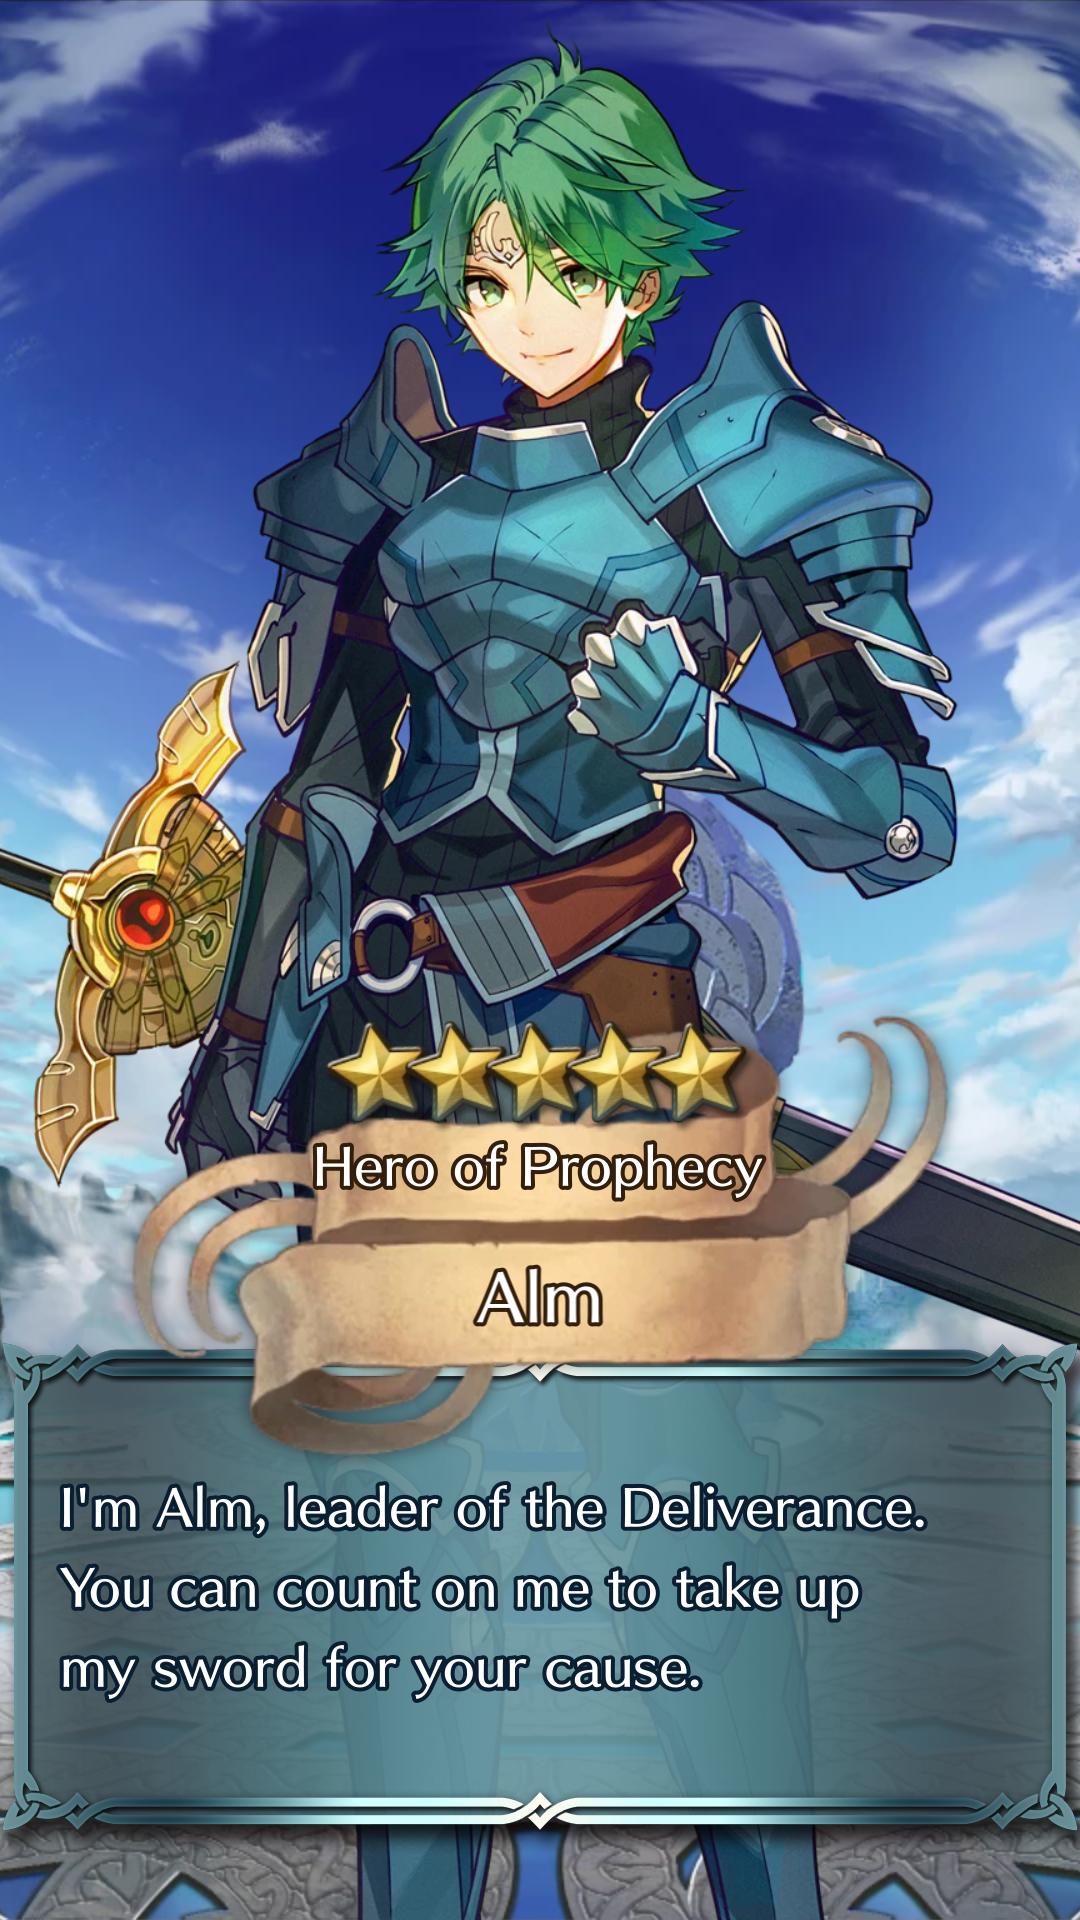 Alm - Fire Emblem Wiki